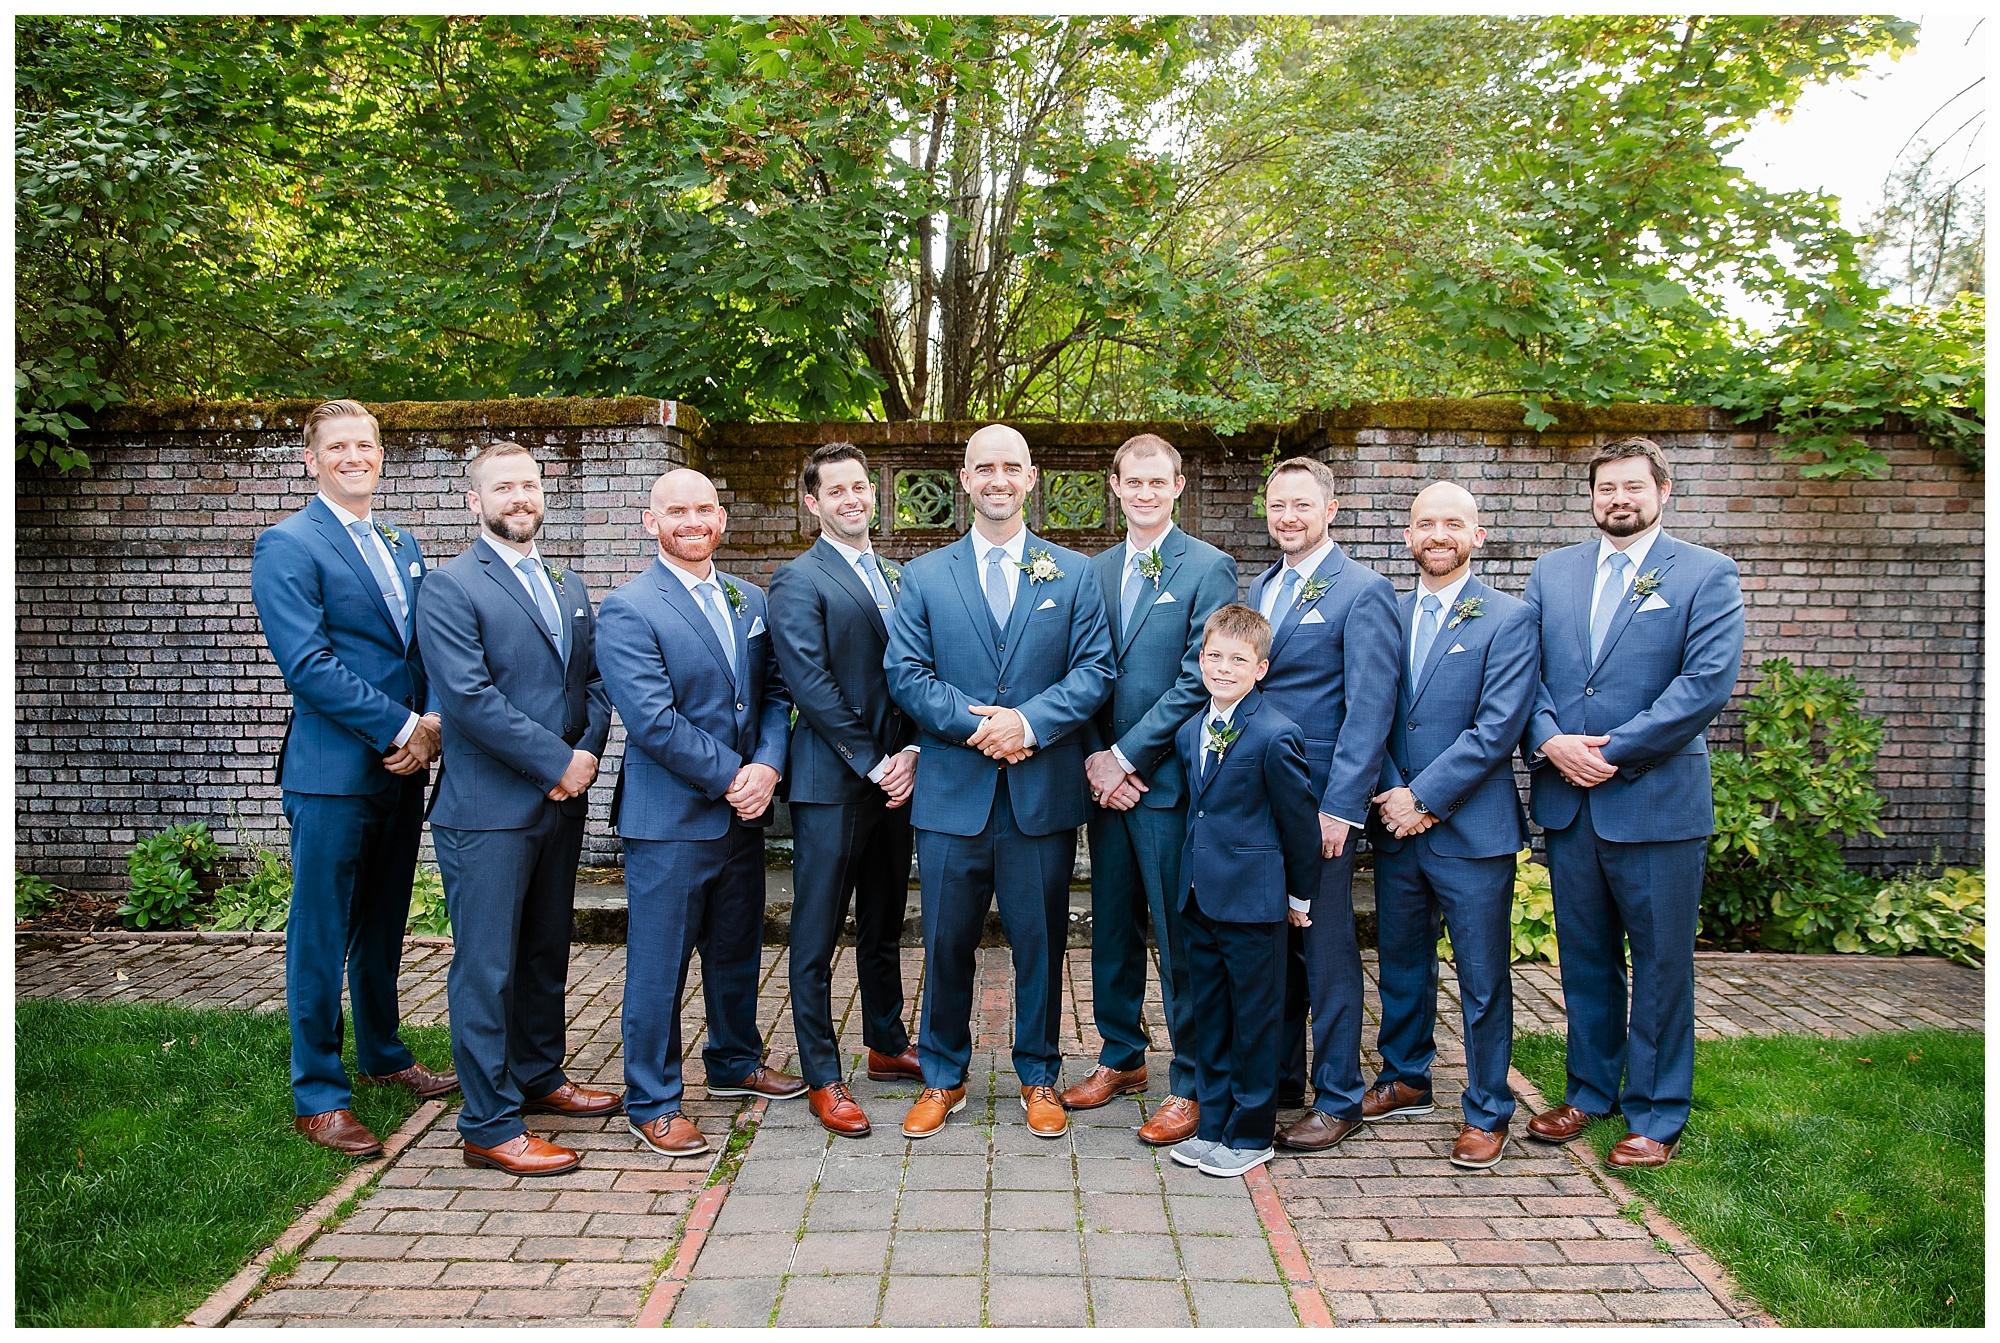 Bozarth-Mansion-wedding-spokane-photography-31.jpg